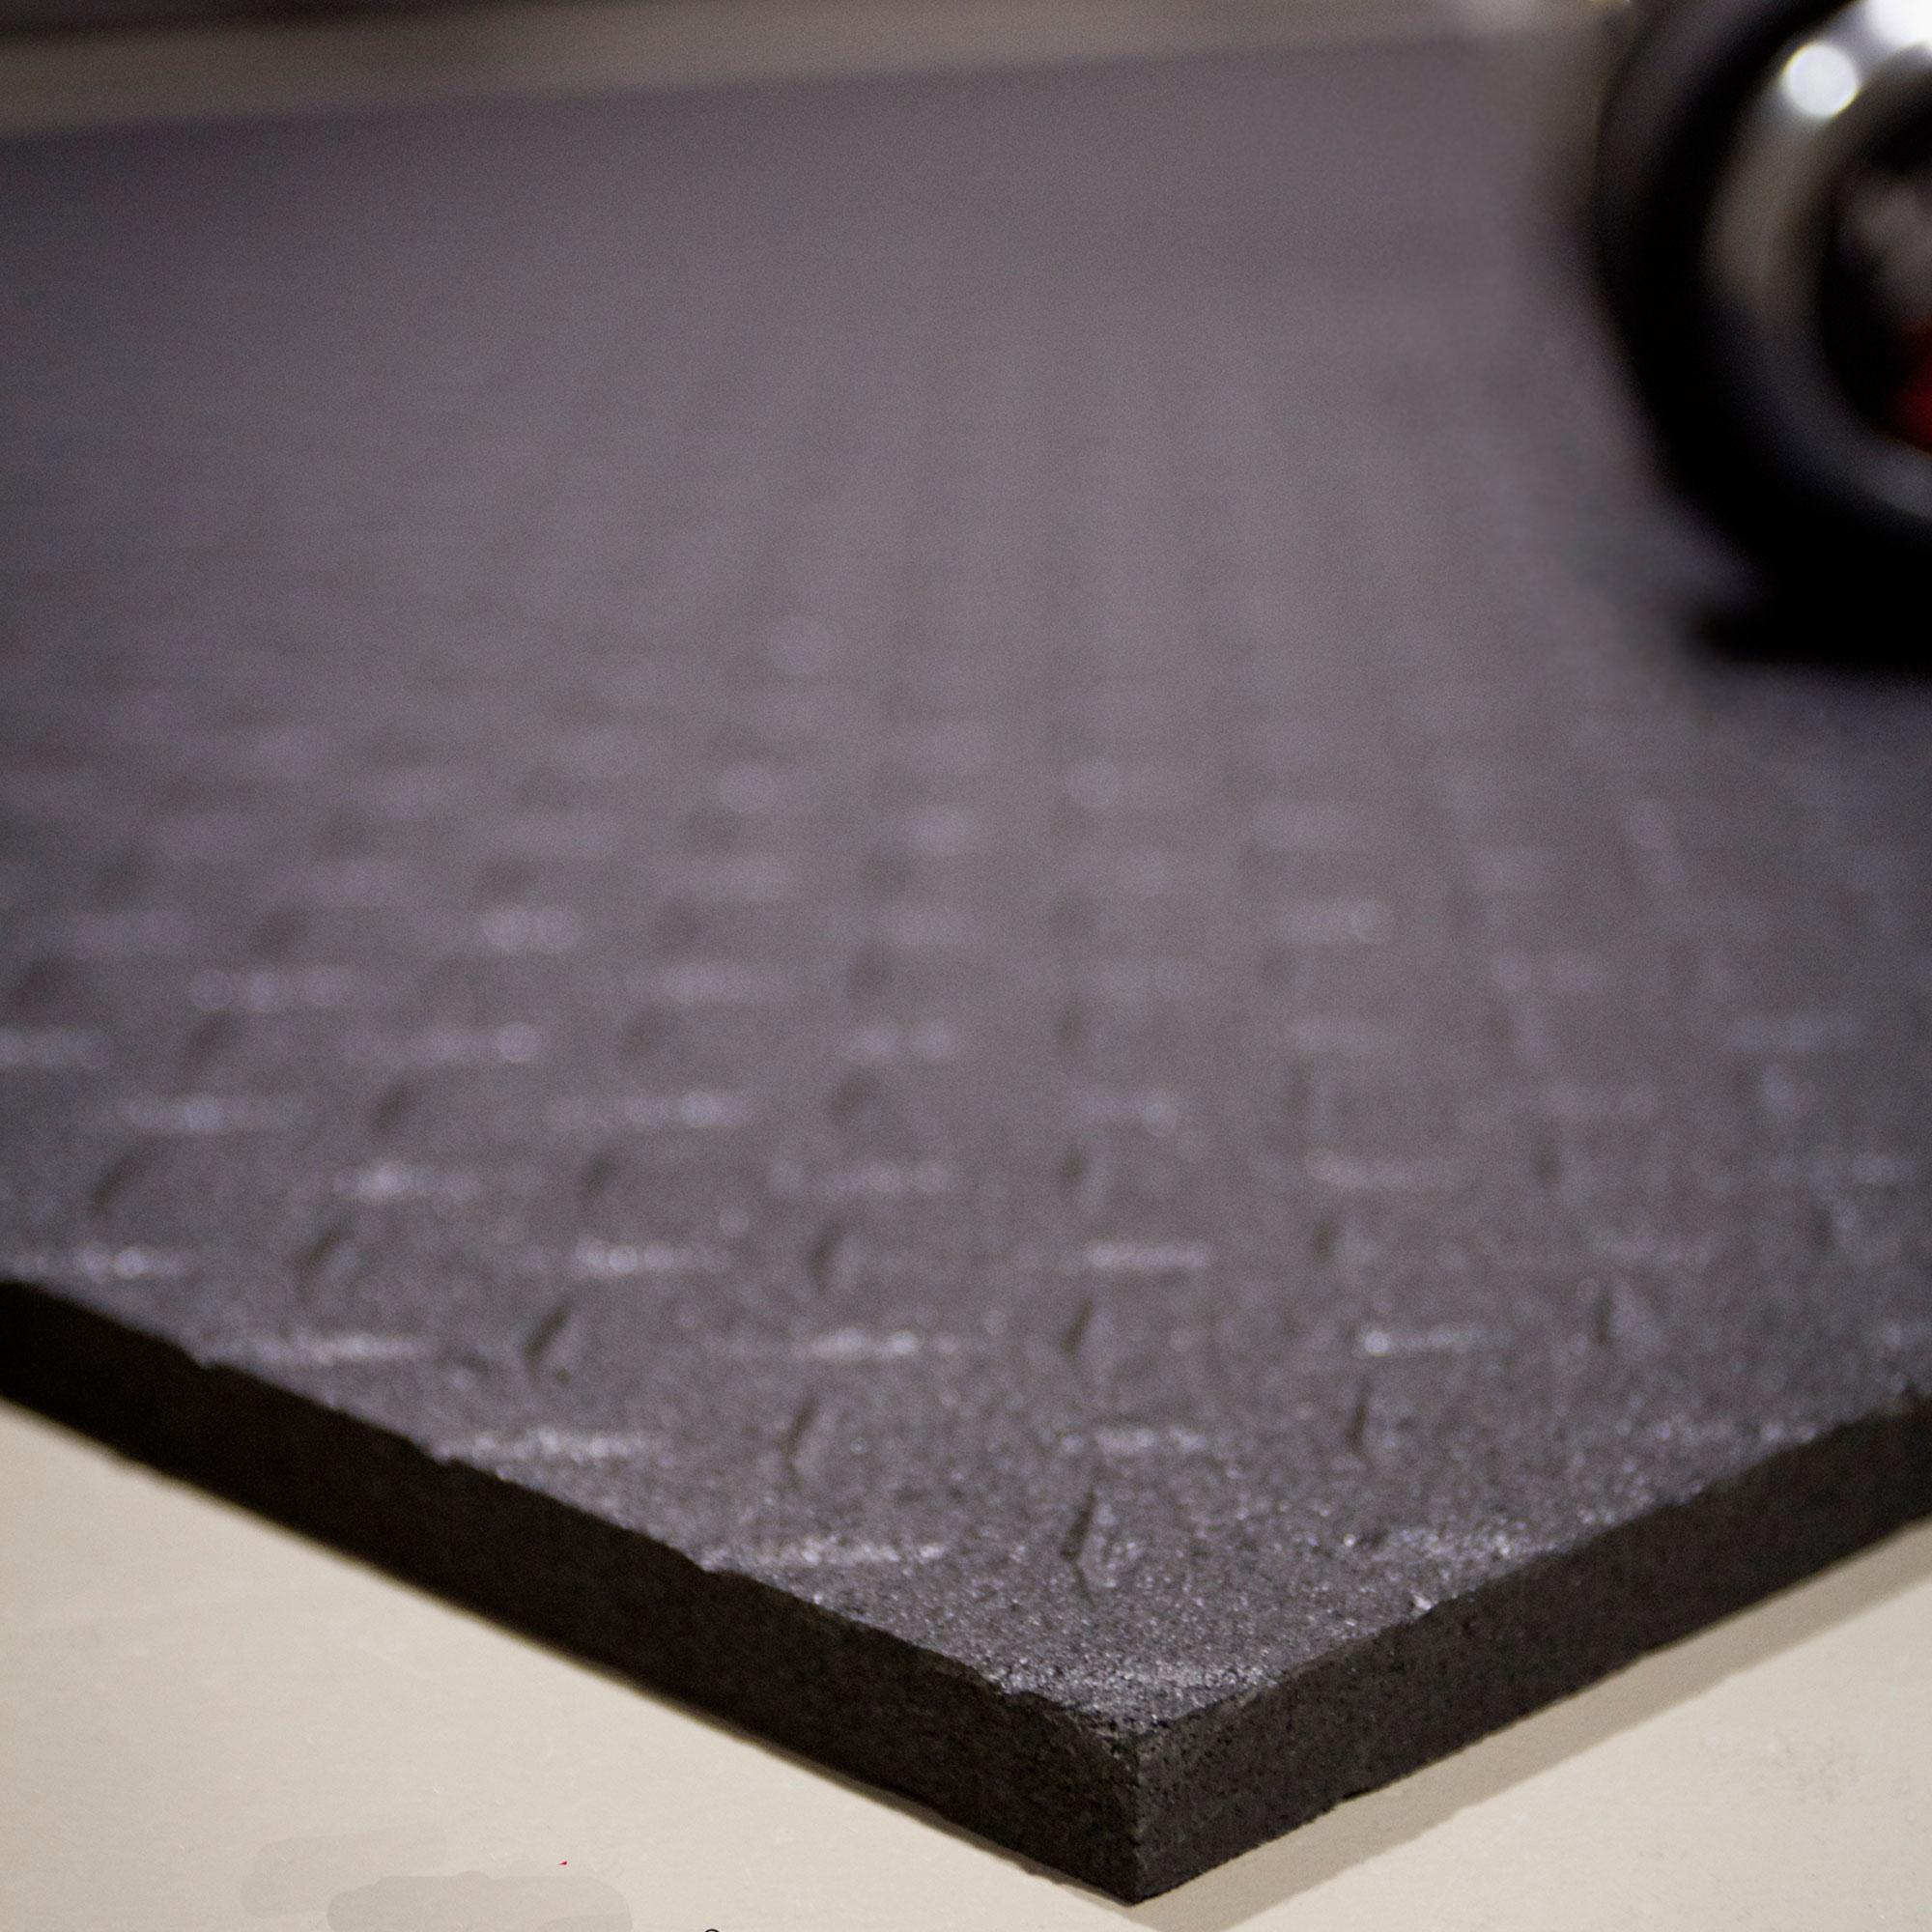 XMark XMat Ultra Thick Gym Flooring